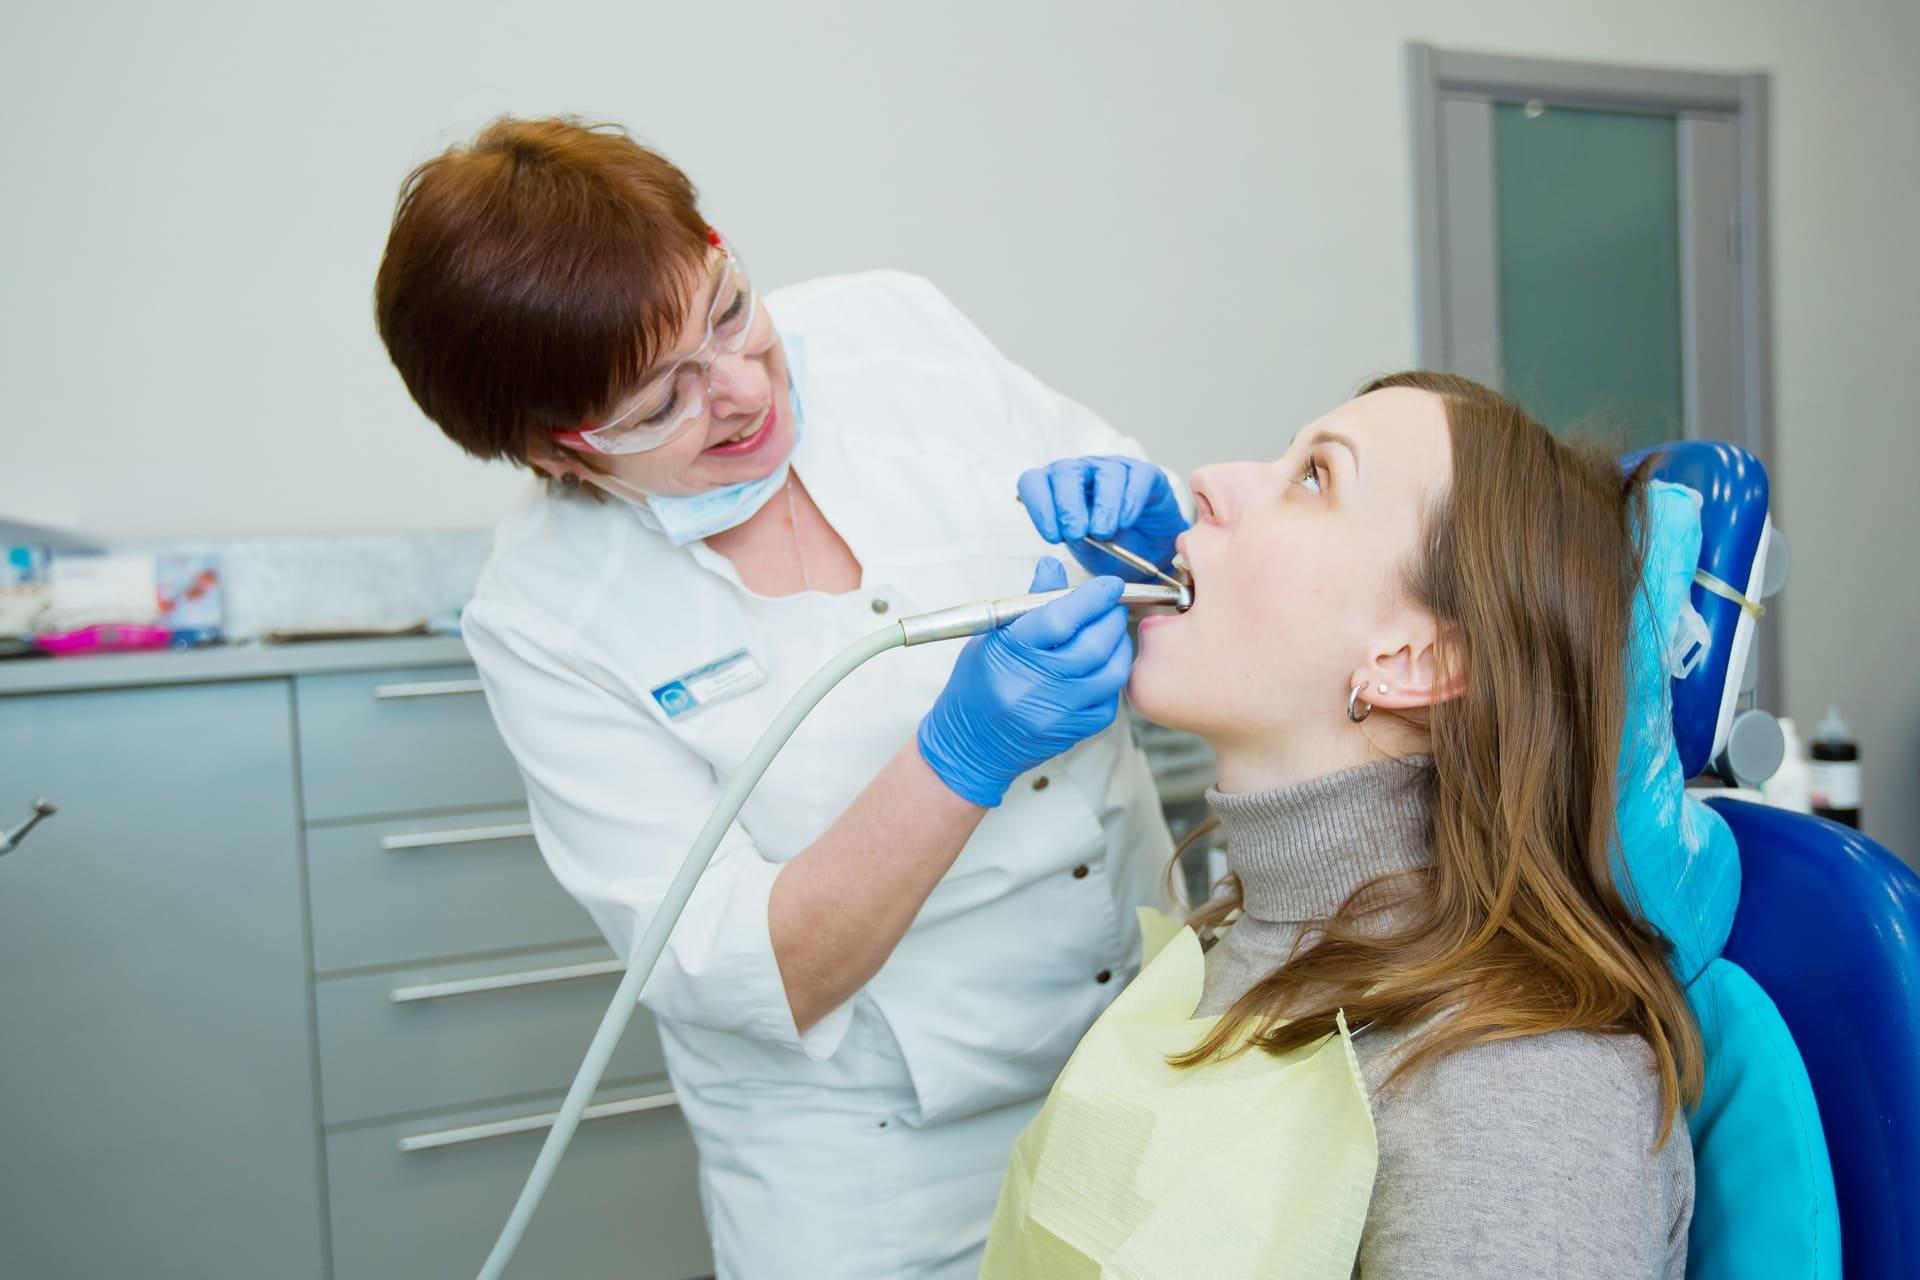 лечение кариеса стоматология металлокерамика волгоград